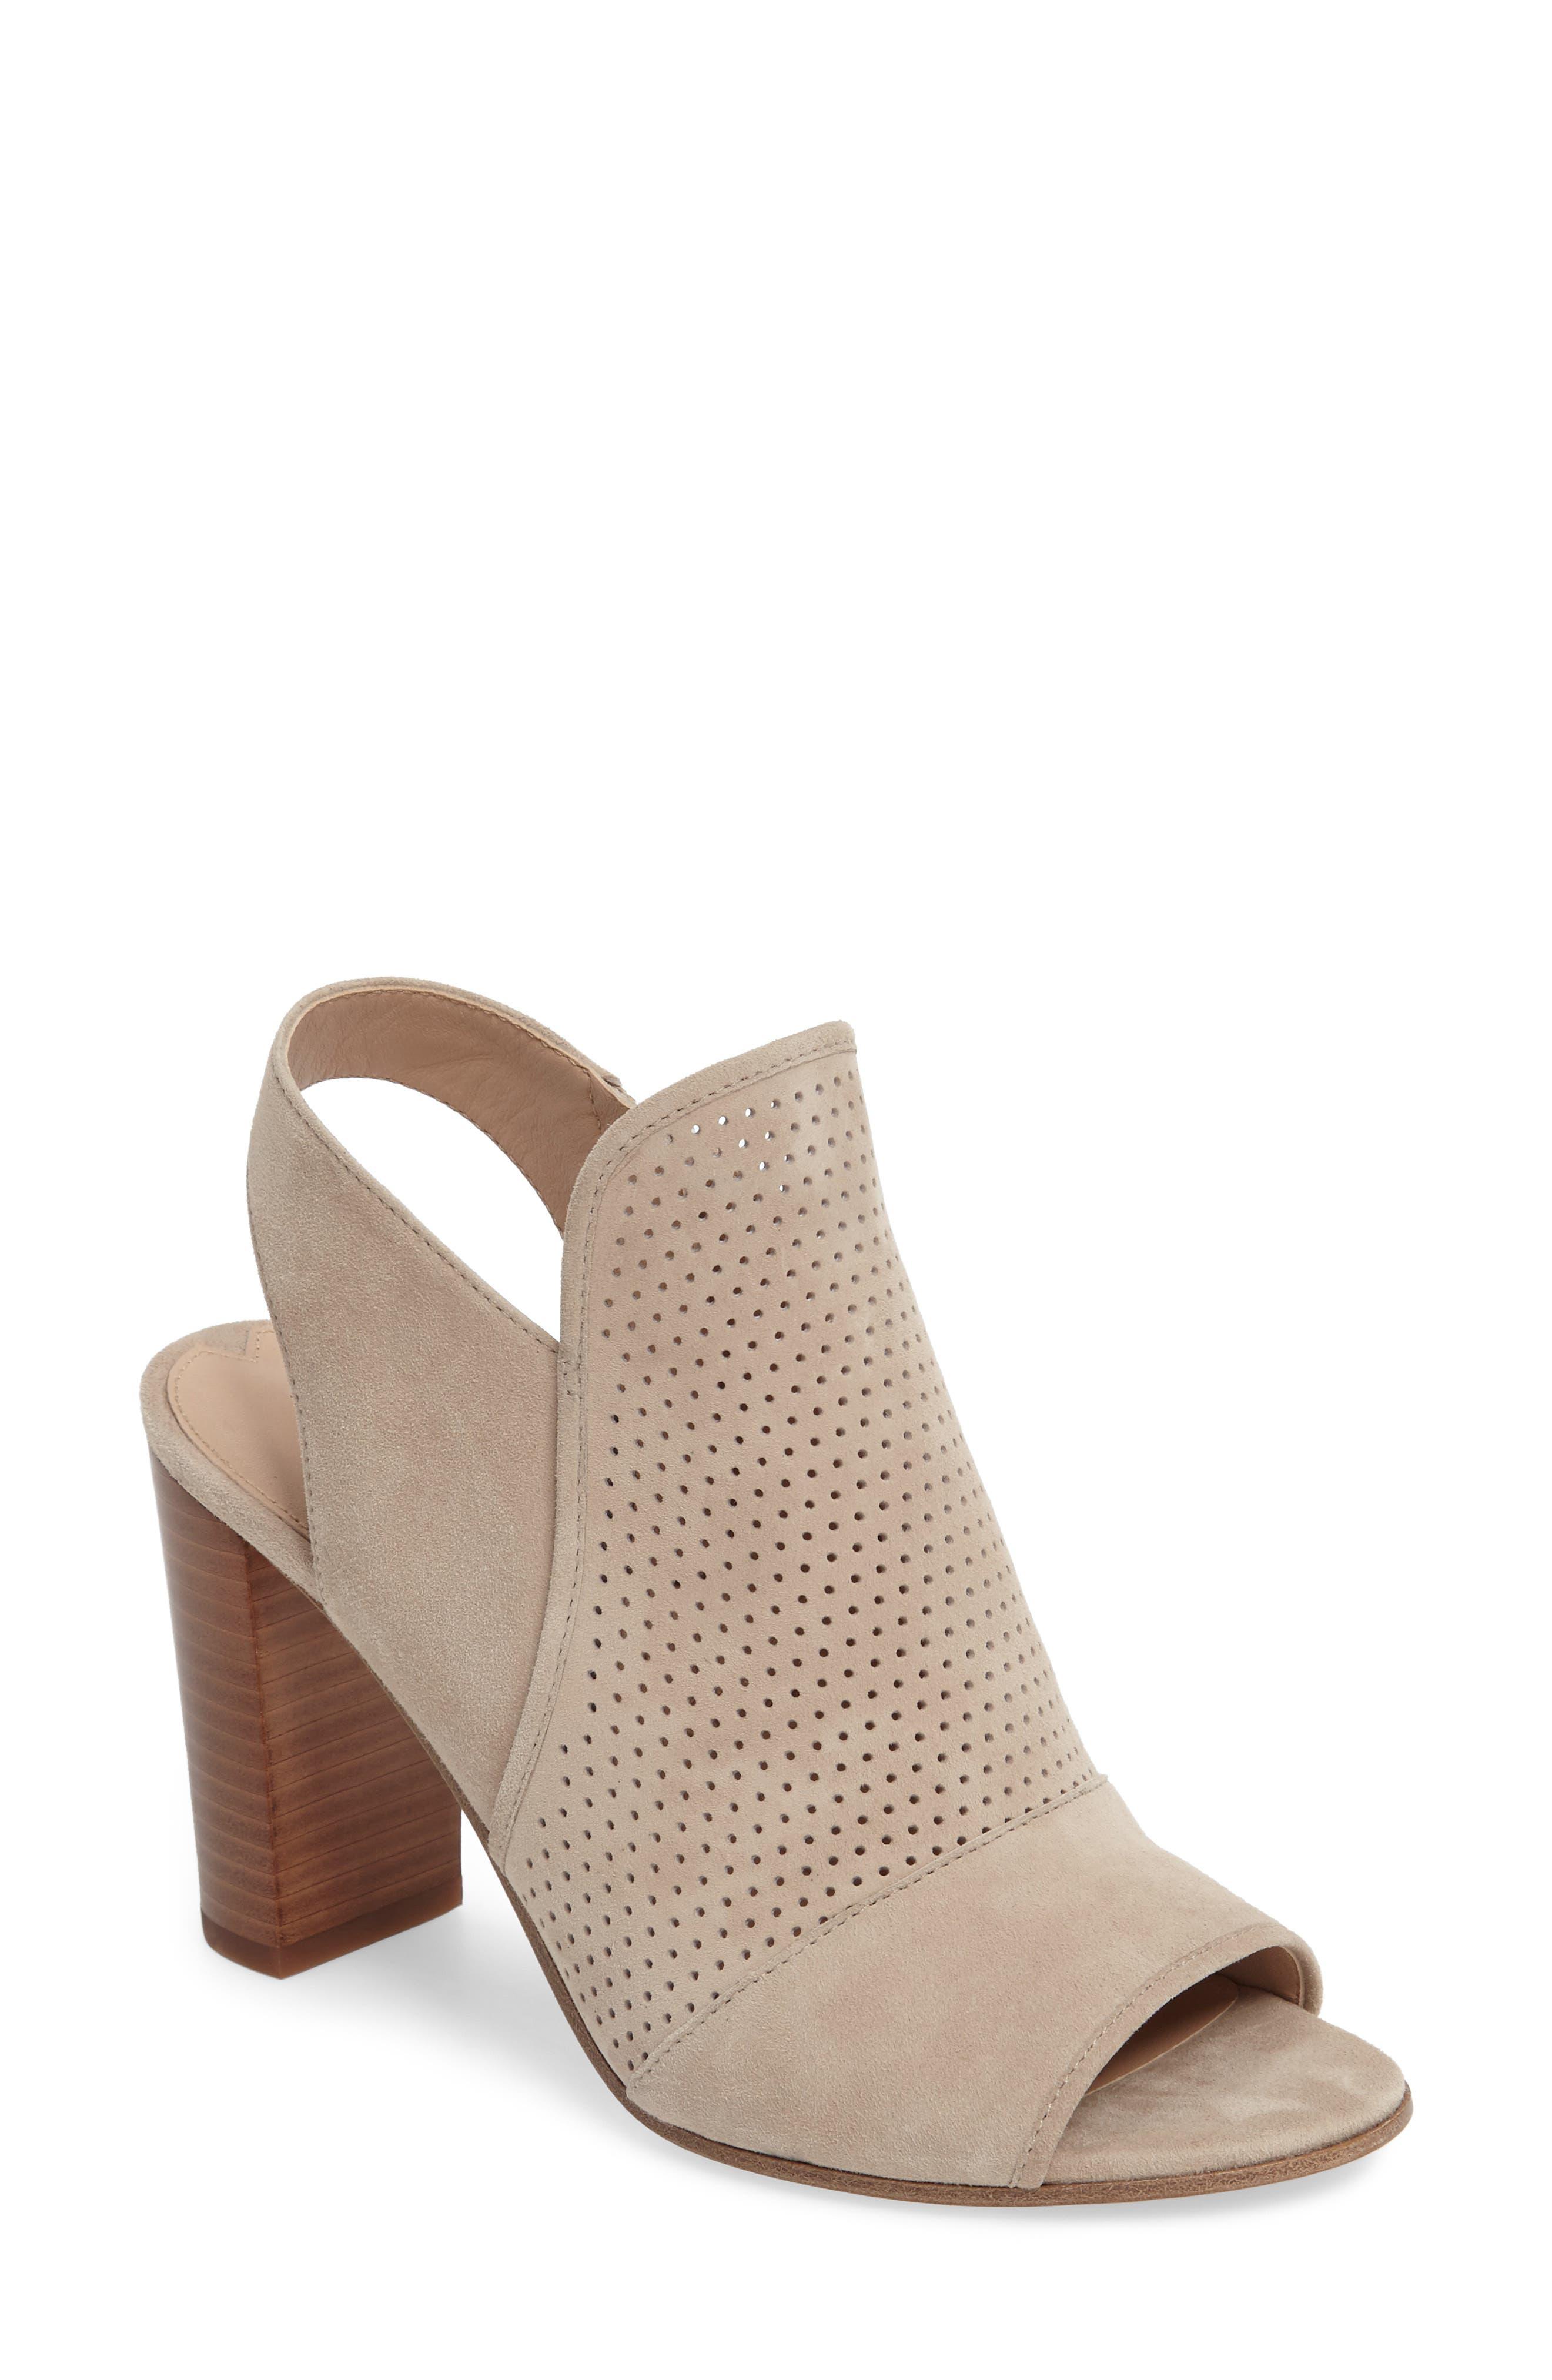 Alternate Image 1 Selected - Via Spiga Gaze Block Heel Sandal (Women)